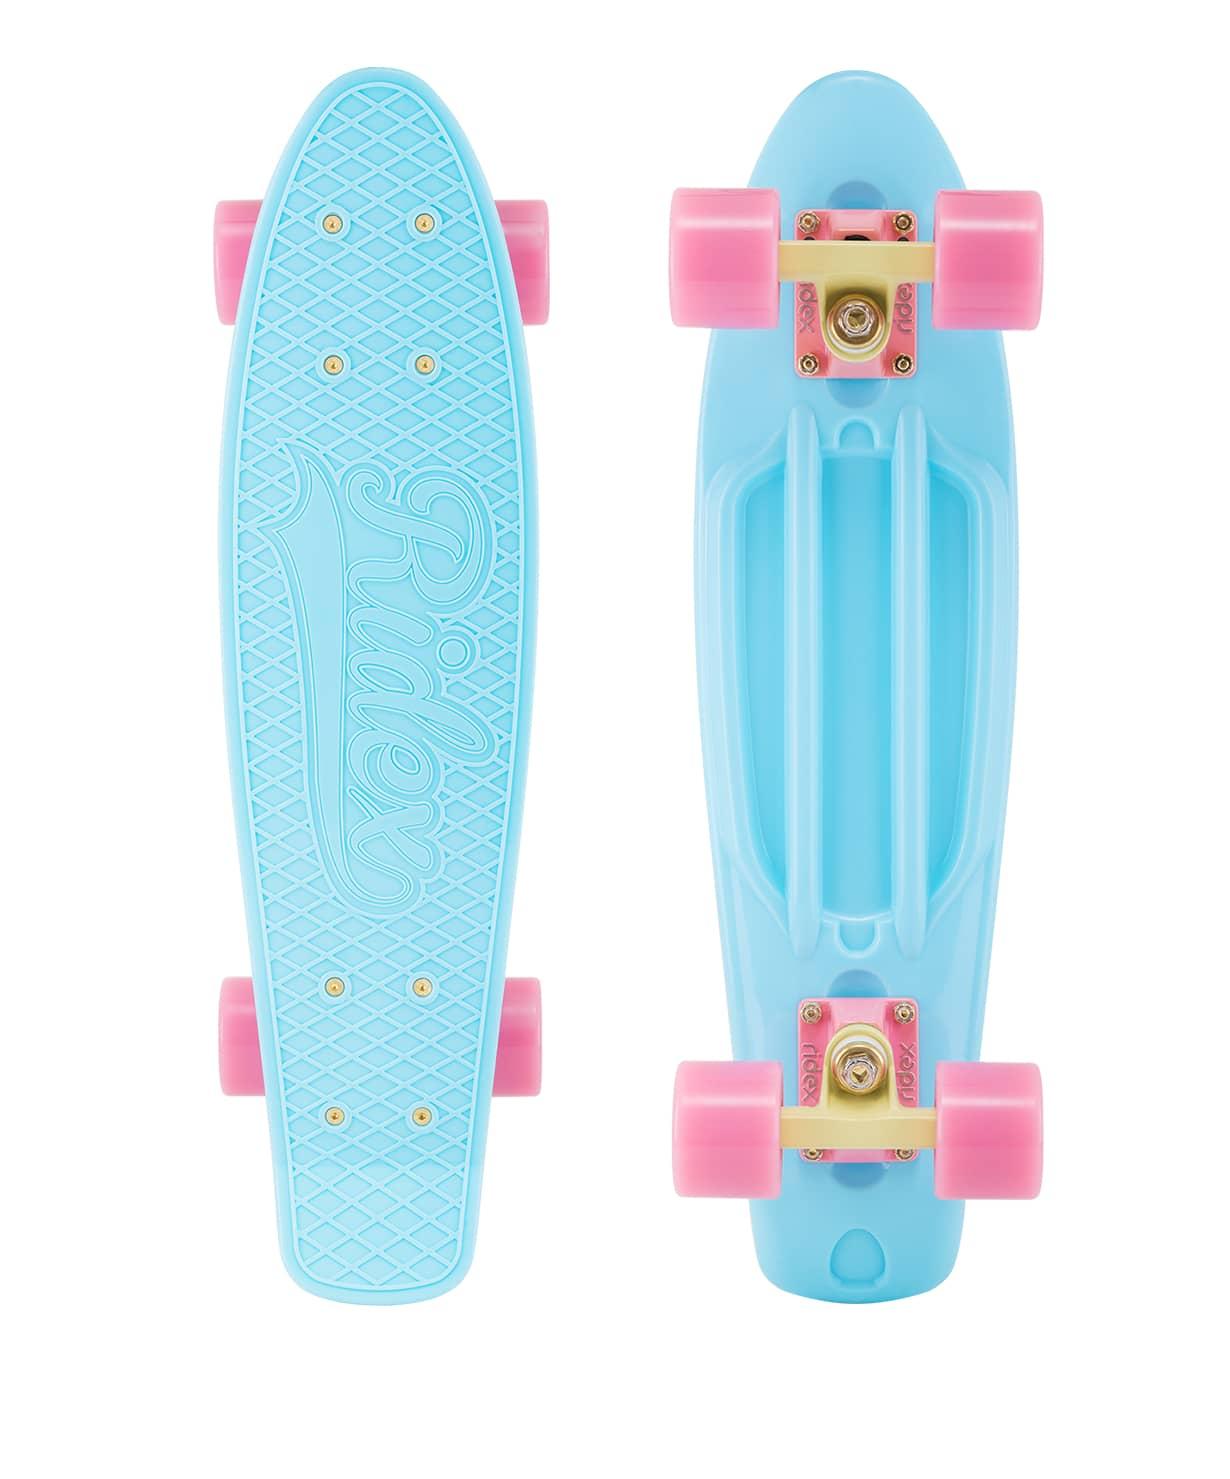 Skateboard Cruiser Plastic Ridex 22 ''x 6'', Abec-7, Azure